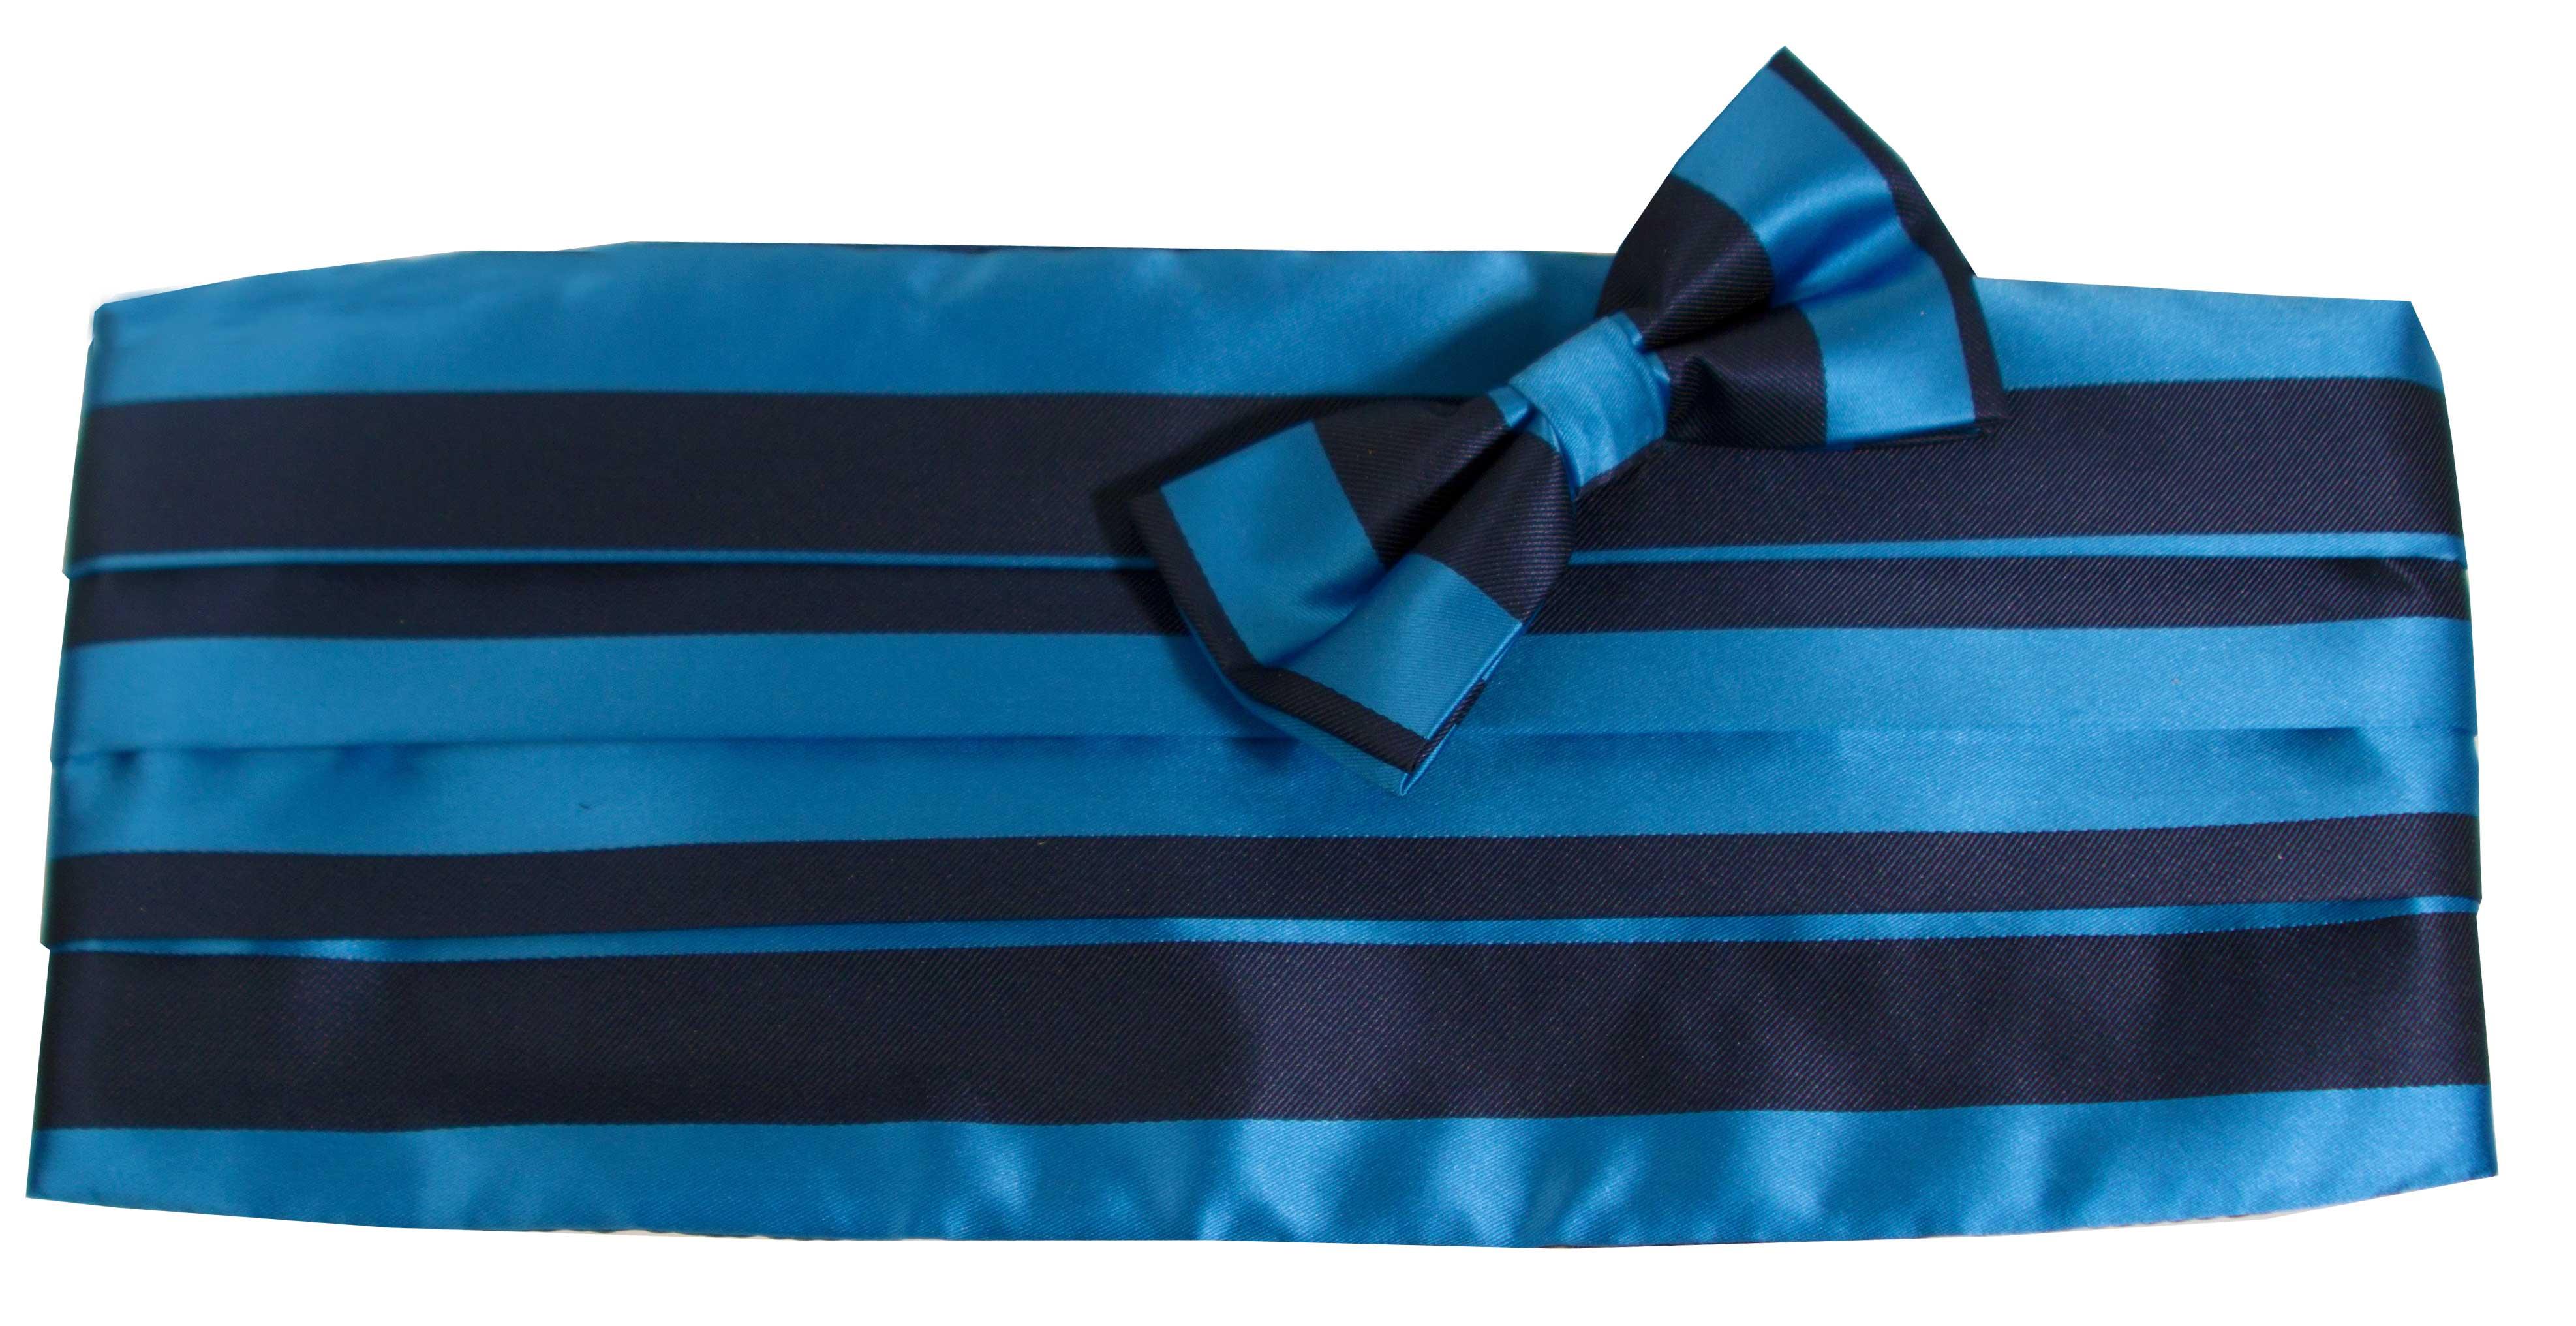 Cumberband (blue and darkblue)